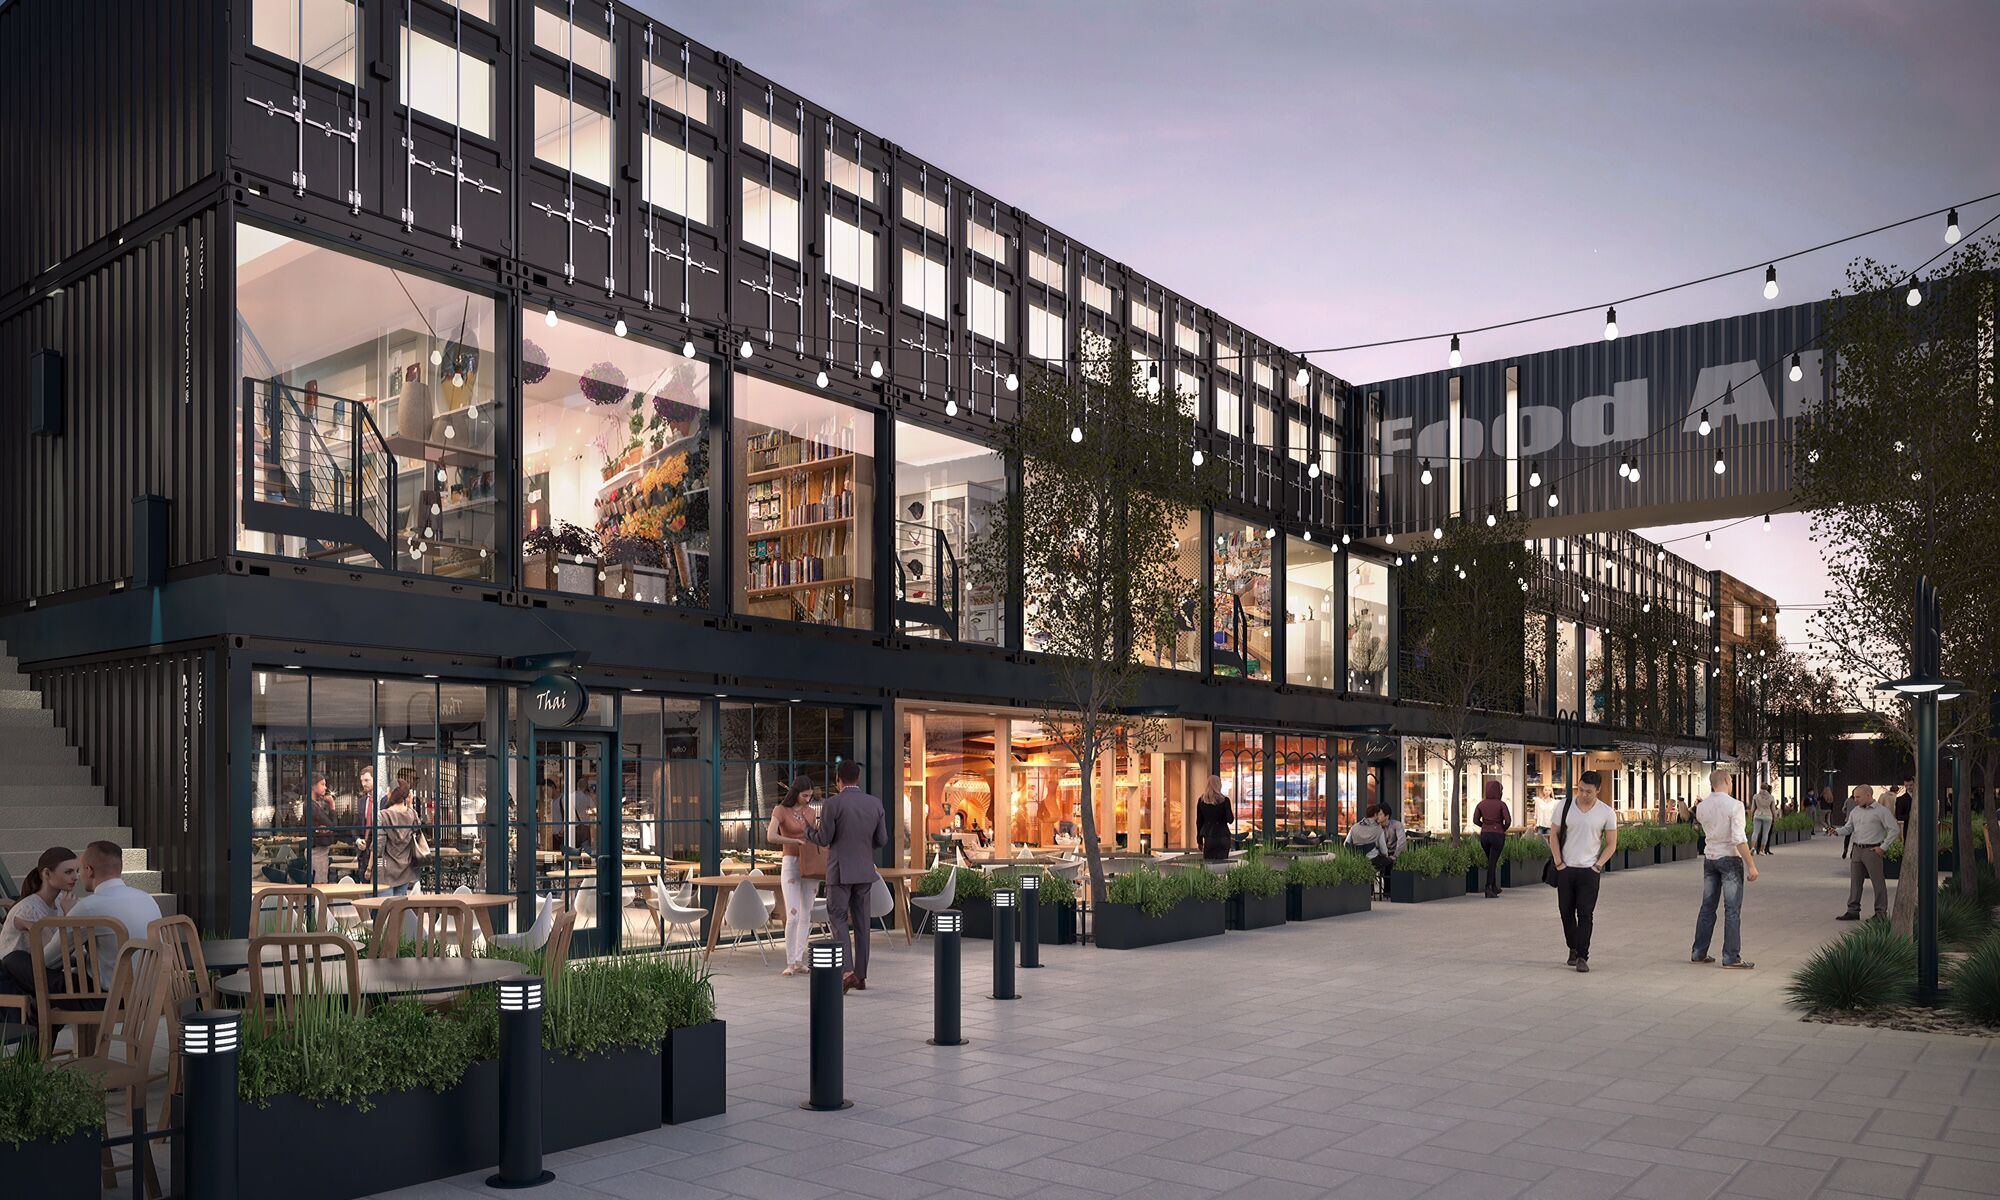 Salt lake city to get first 39 food alley 39 in 2019 kutv - Garden state plaza mall restaurants ...